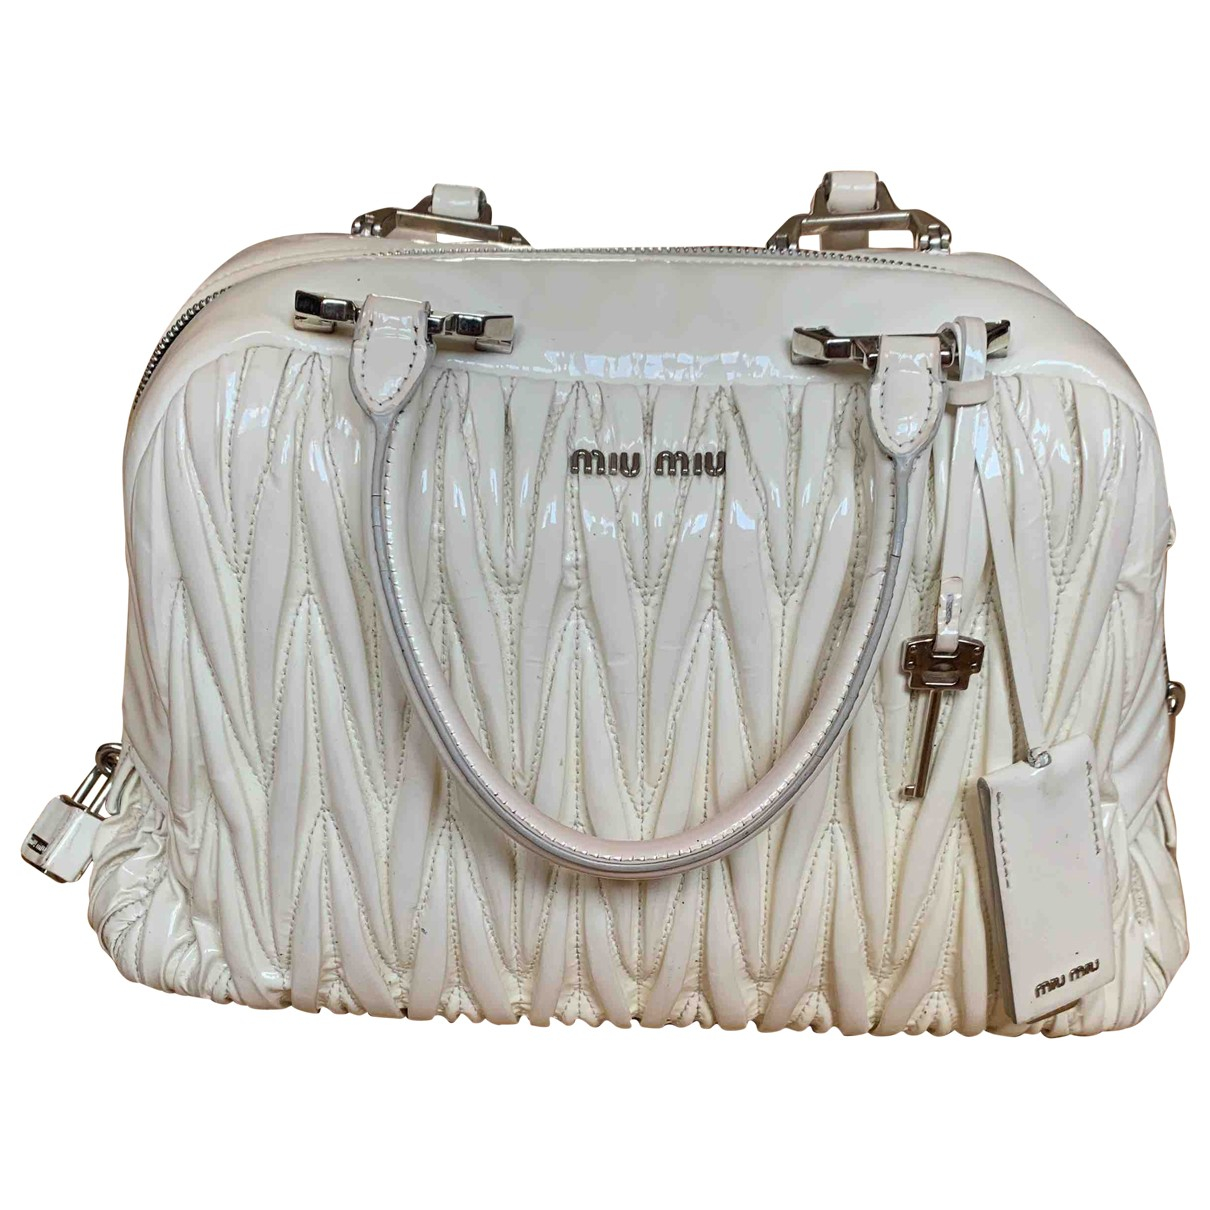 Miu Miu Matelassé White Patent leather handbag for Women \N